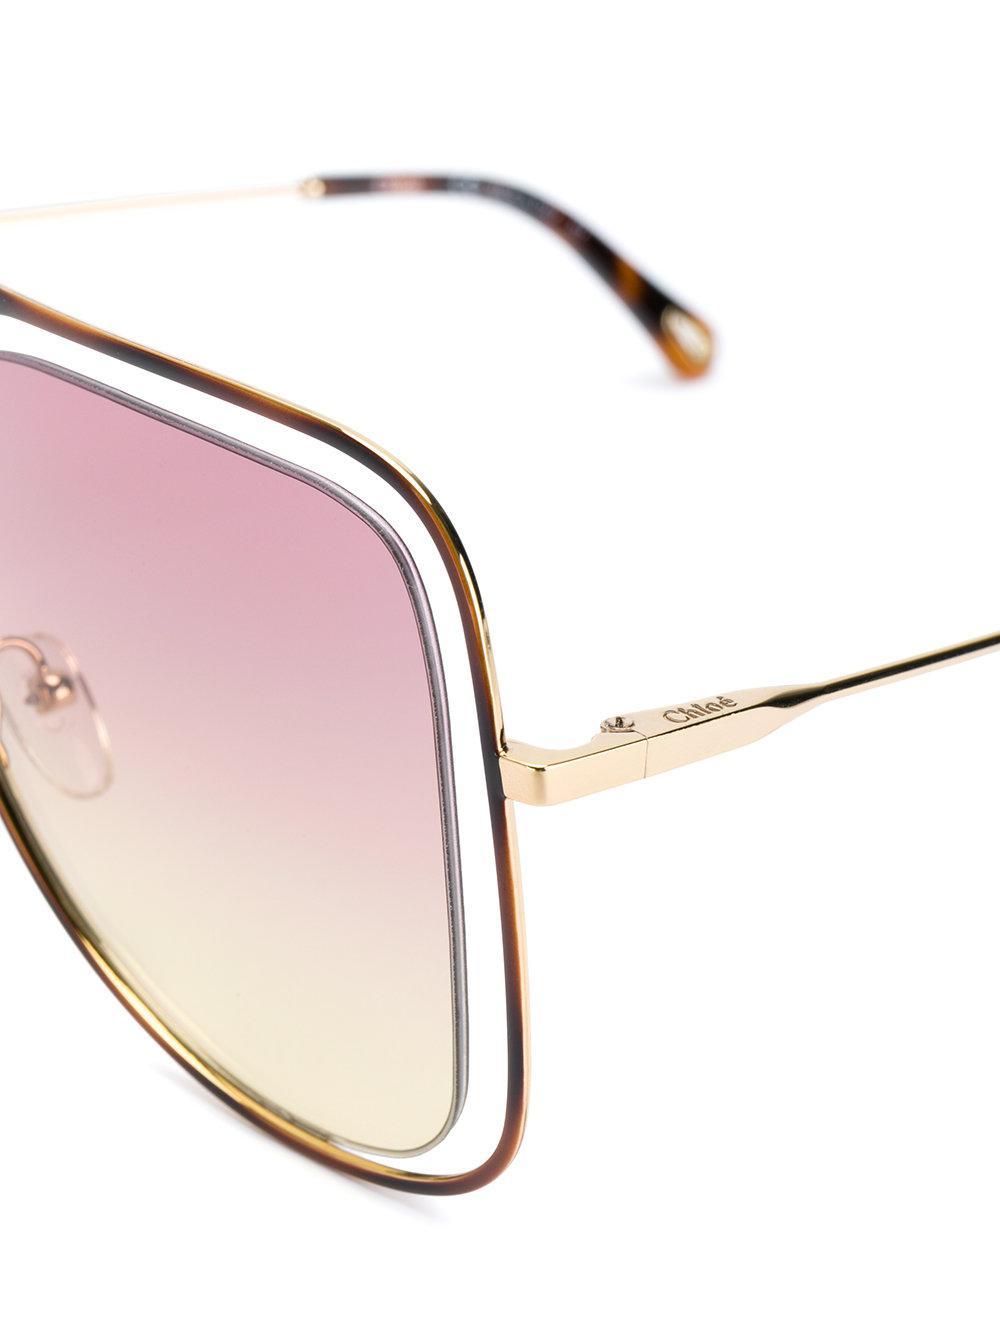 4445b74130c Chloé - Metallic Floating Frame Sunglasses - Lyst. View fullscreen